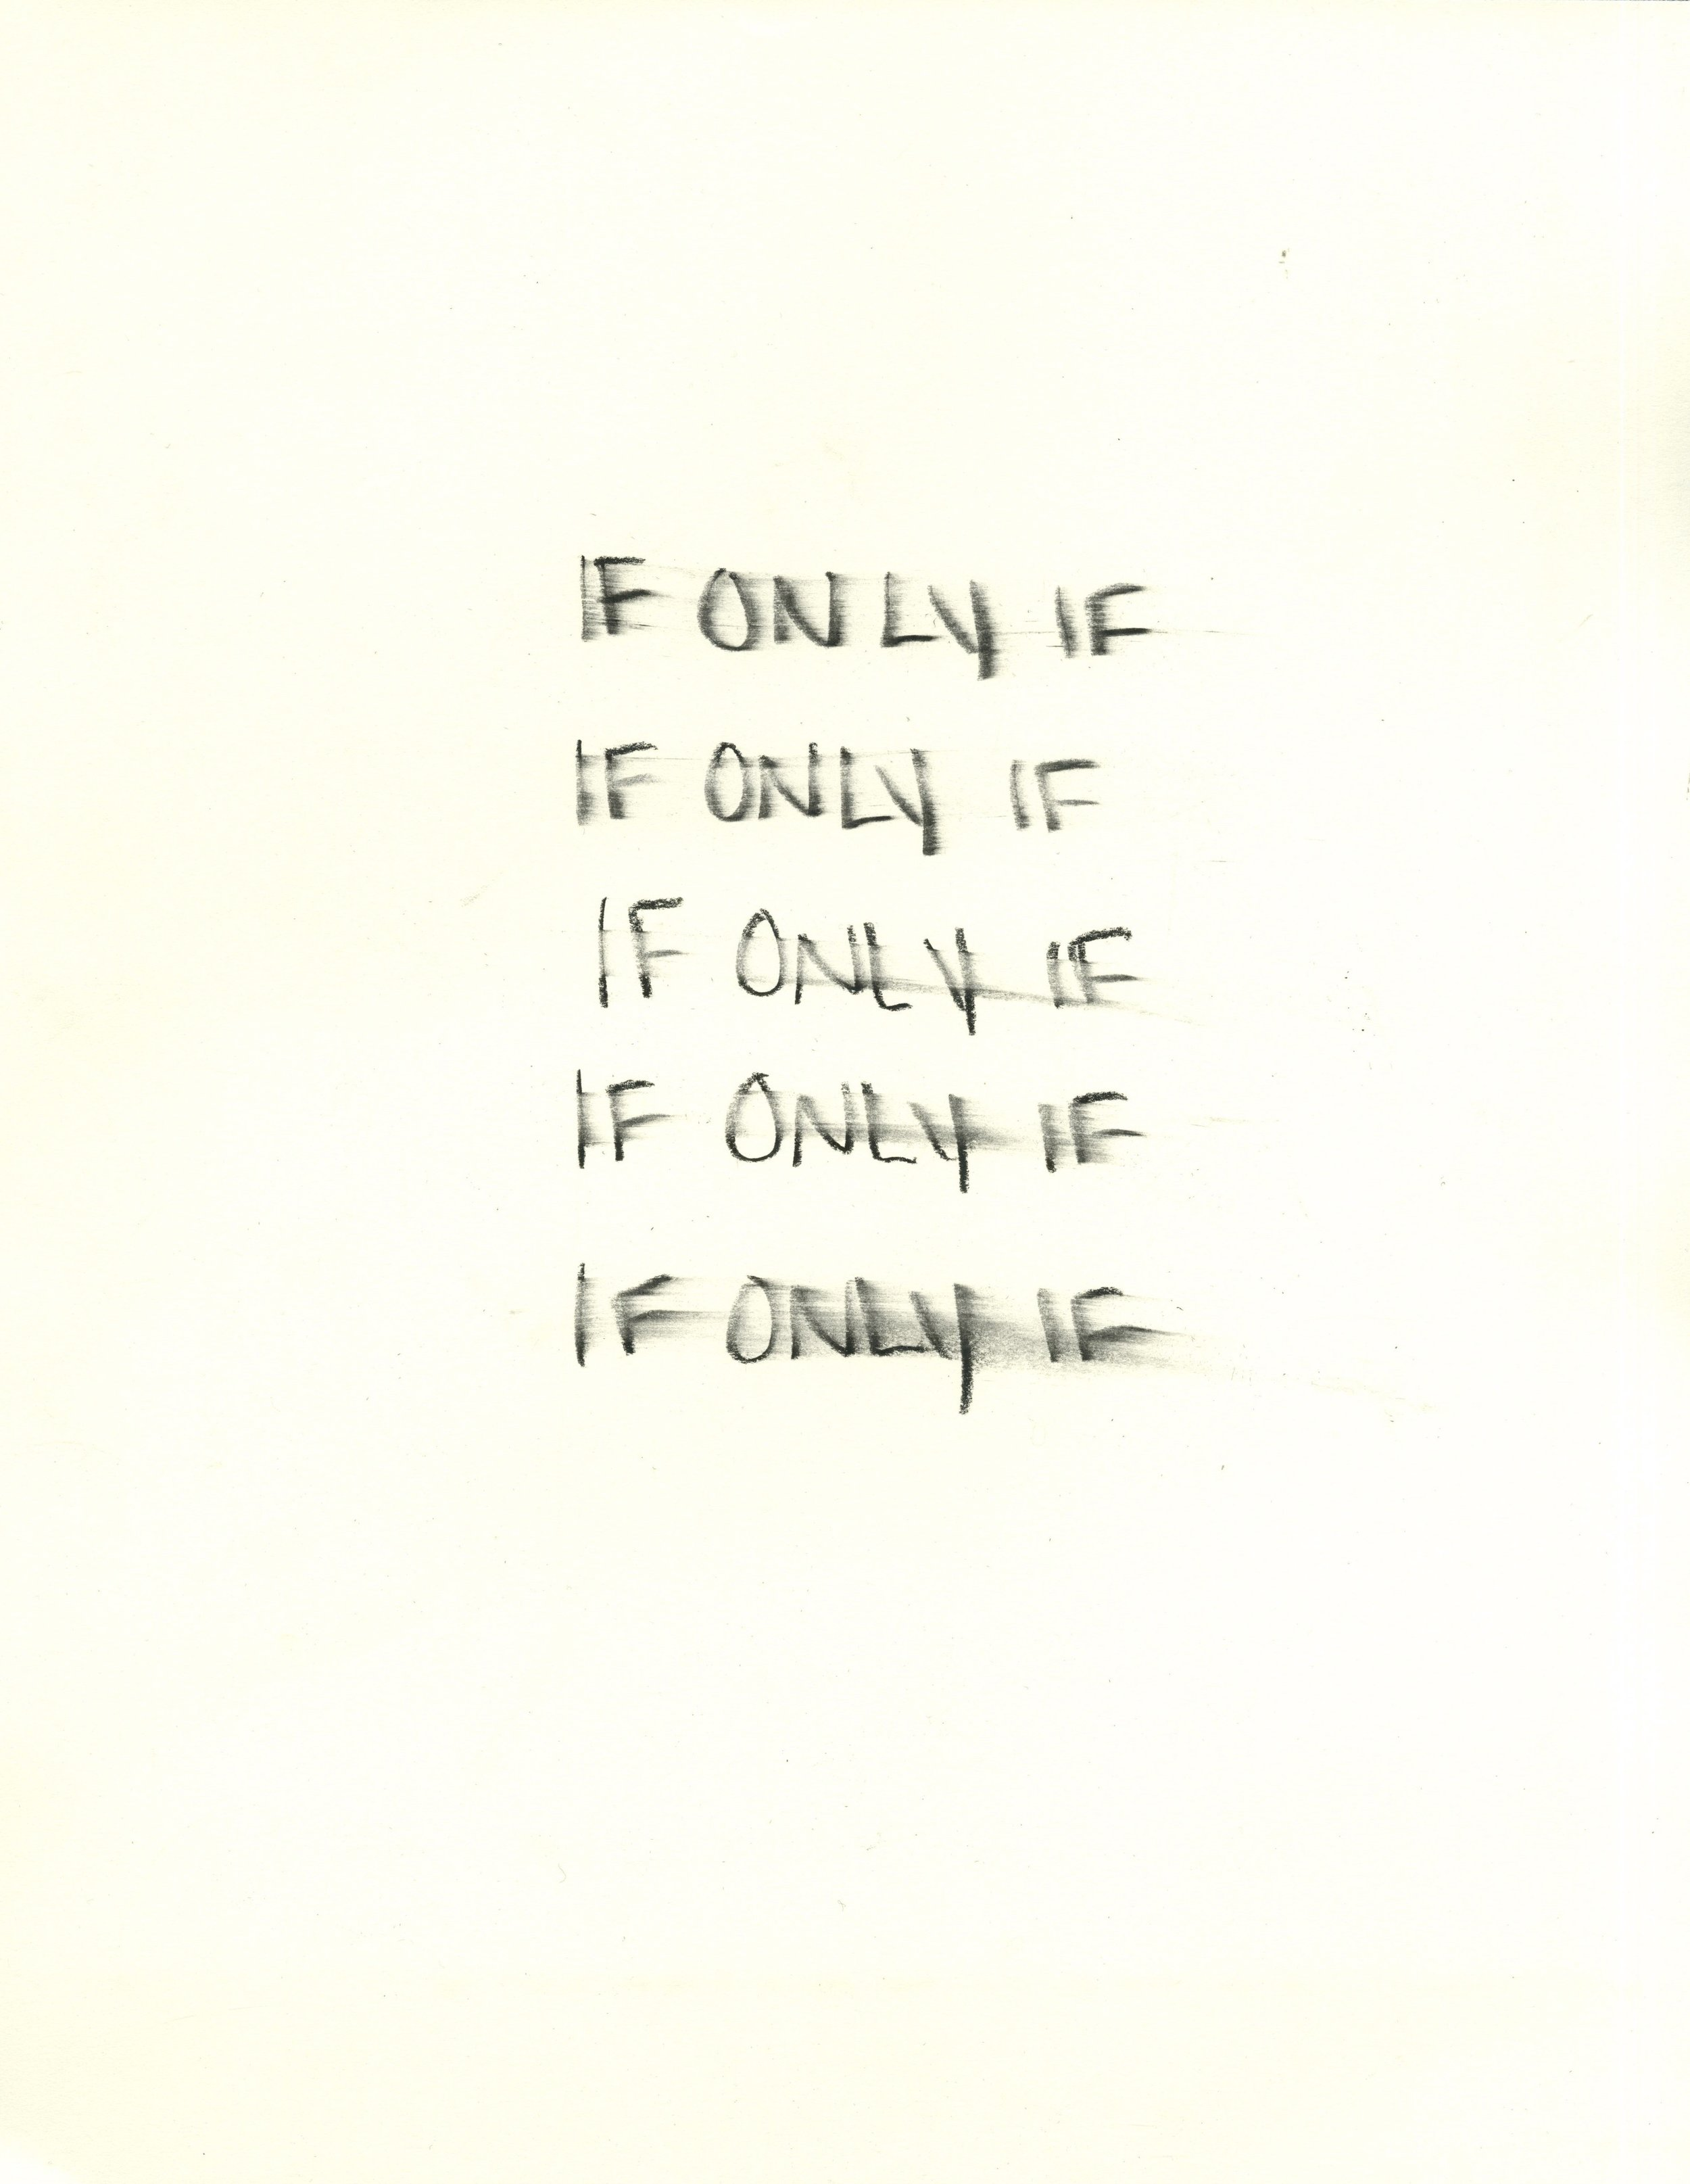 onlyif006.jpg